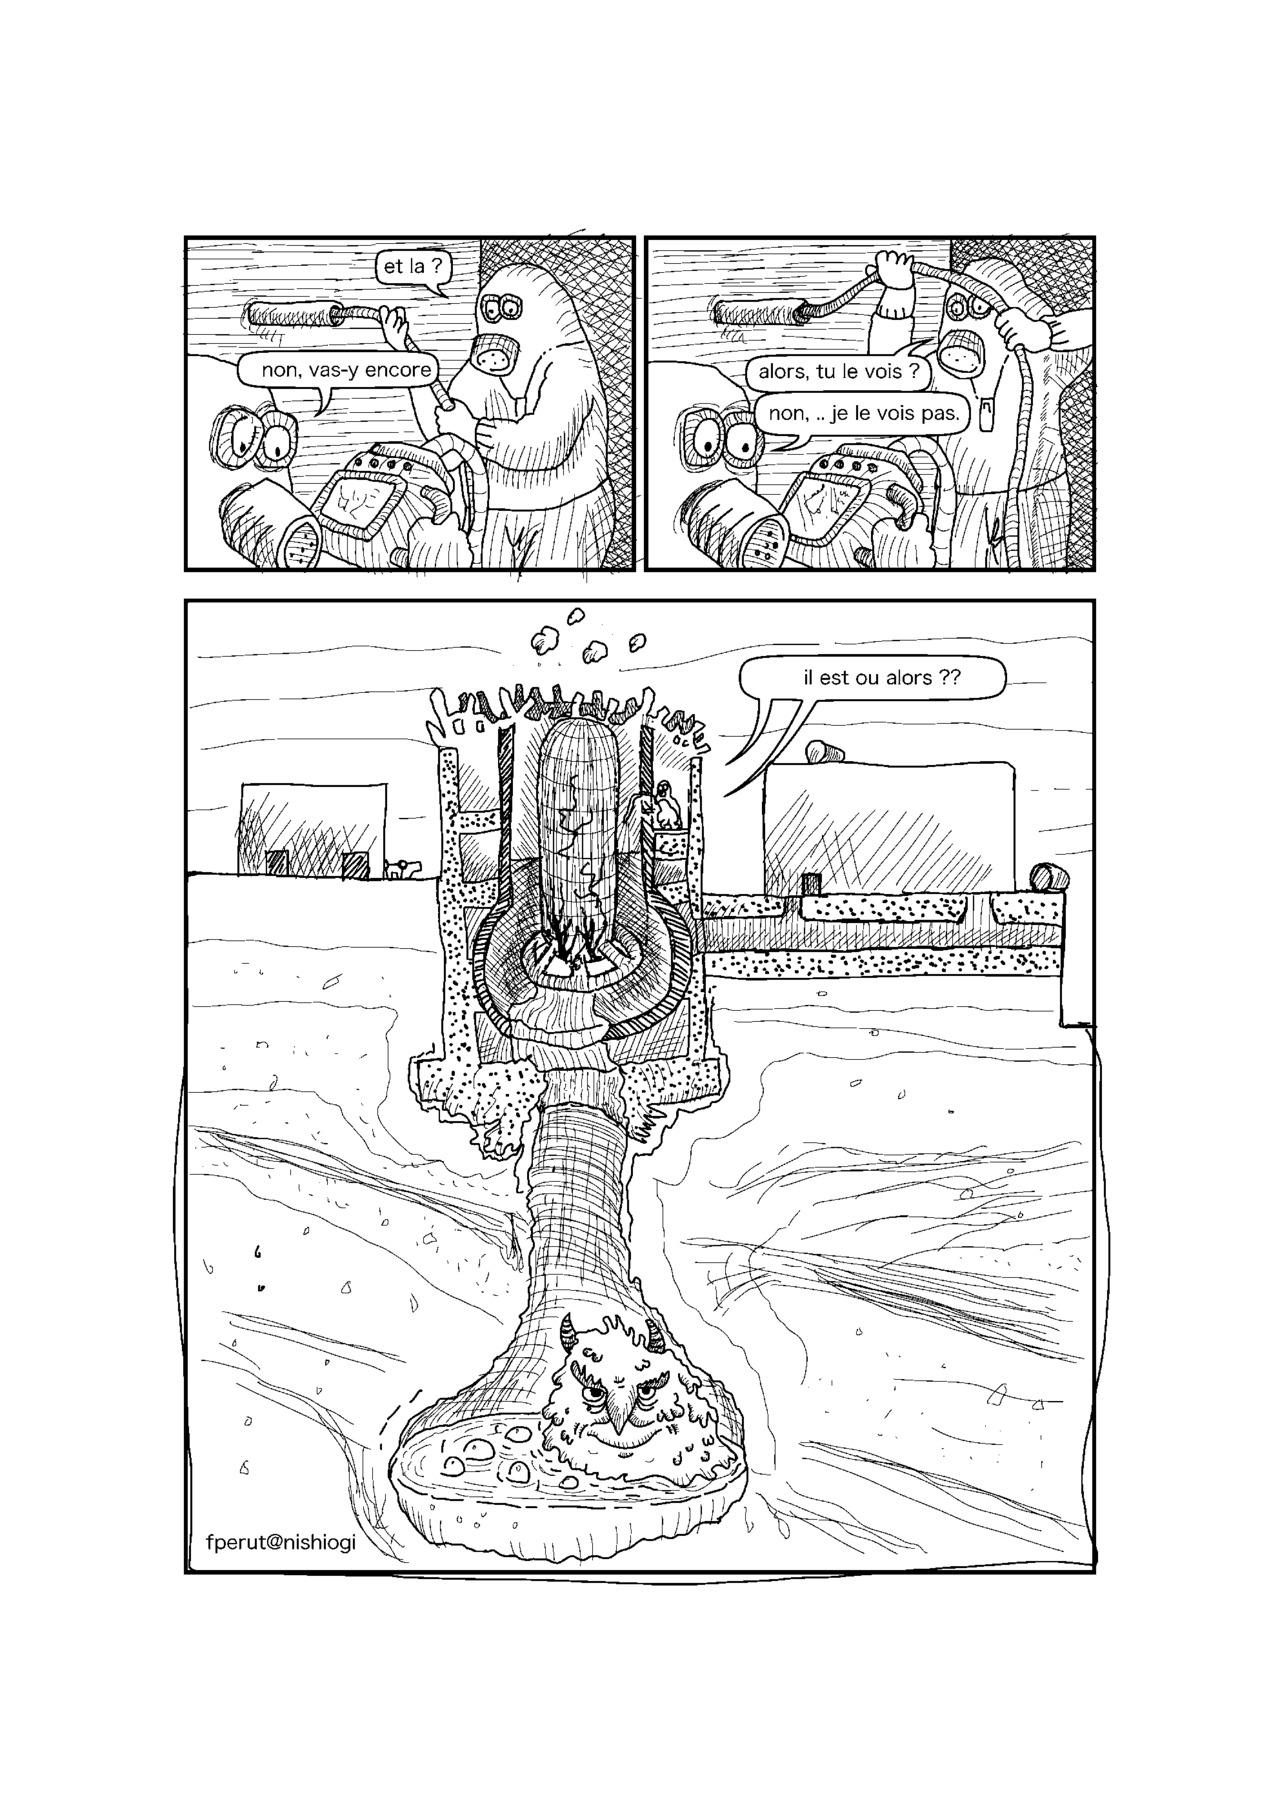 Endoscopic Exam of Fukushima Reactor